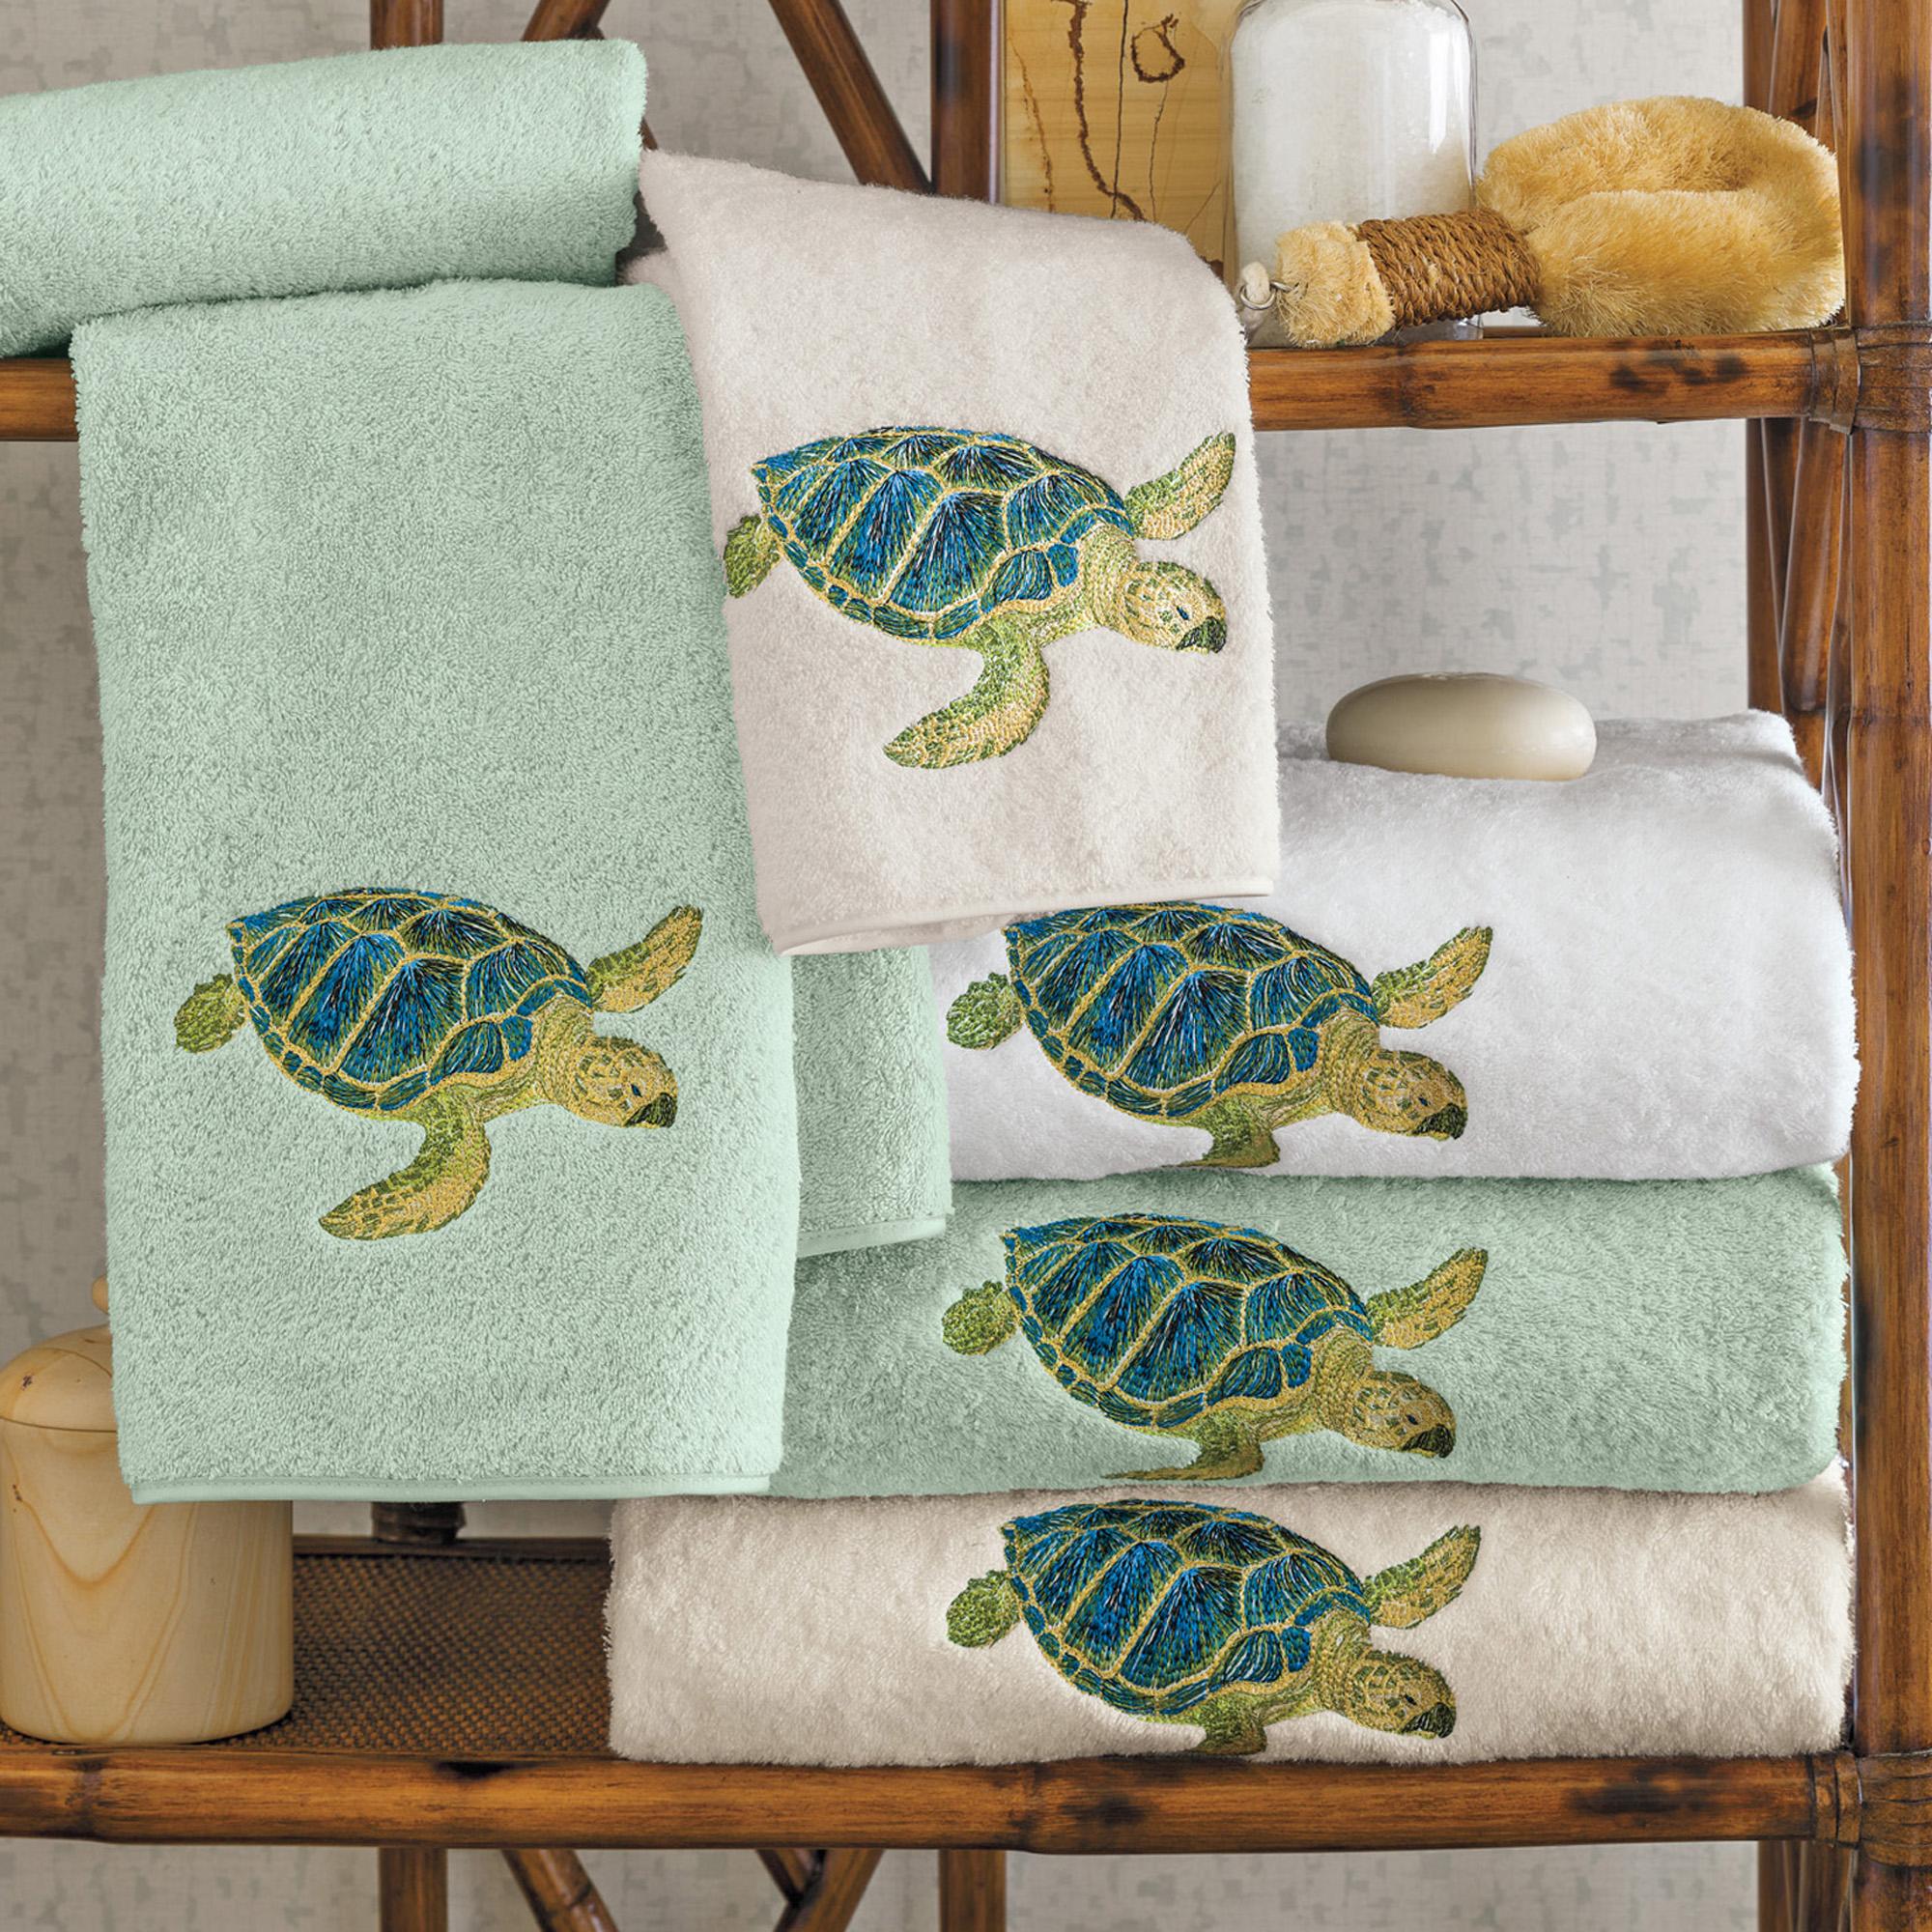 Ideal Island Sea Turtle Towels | Gump's MV37